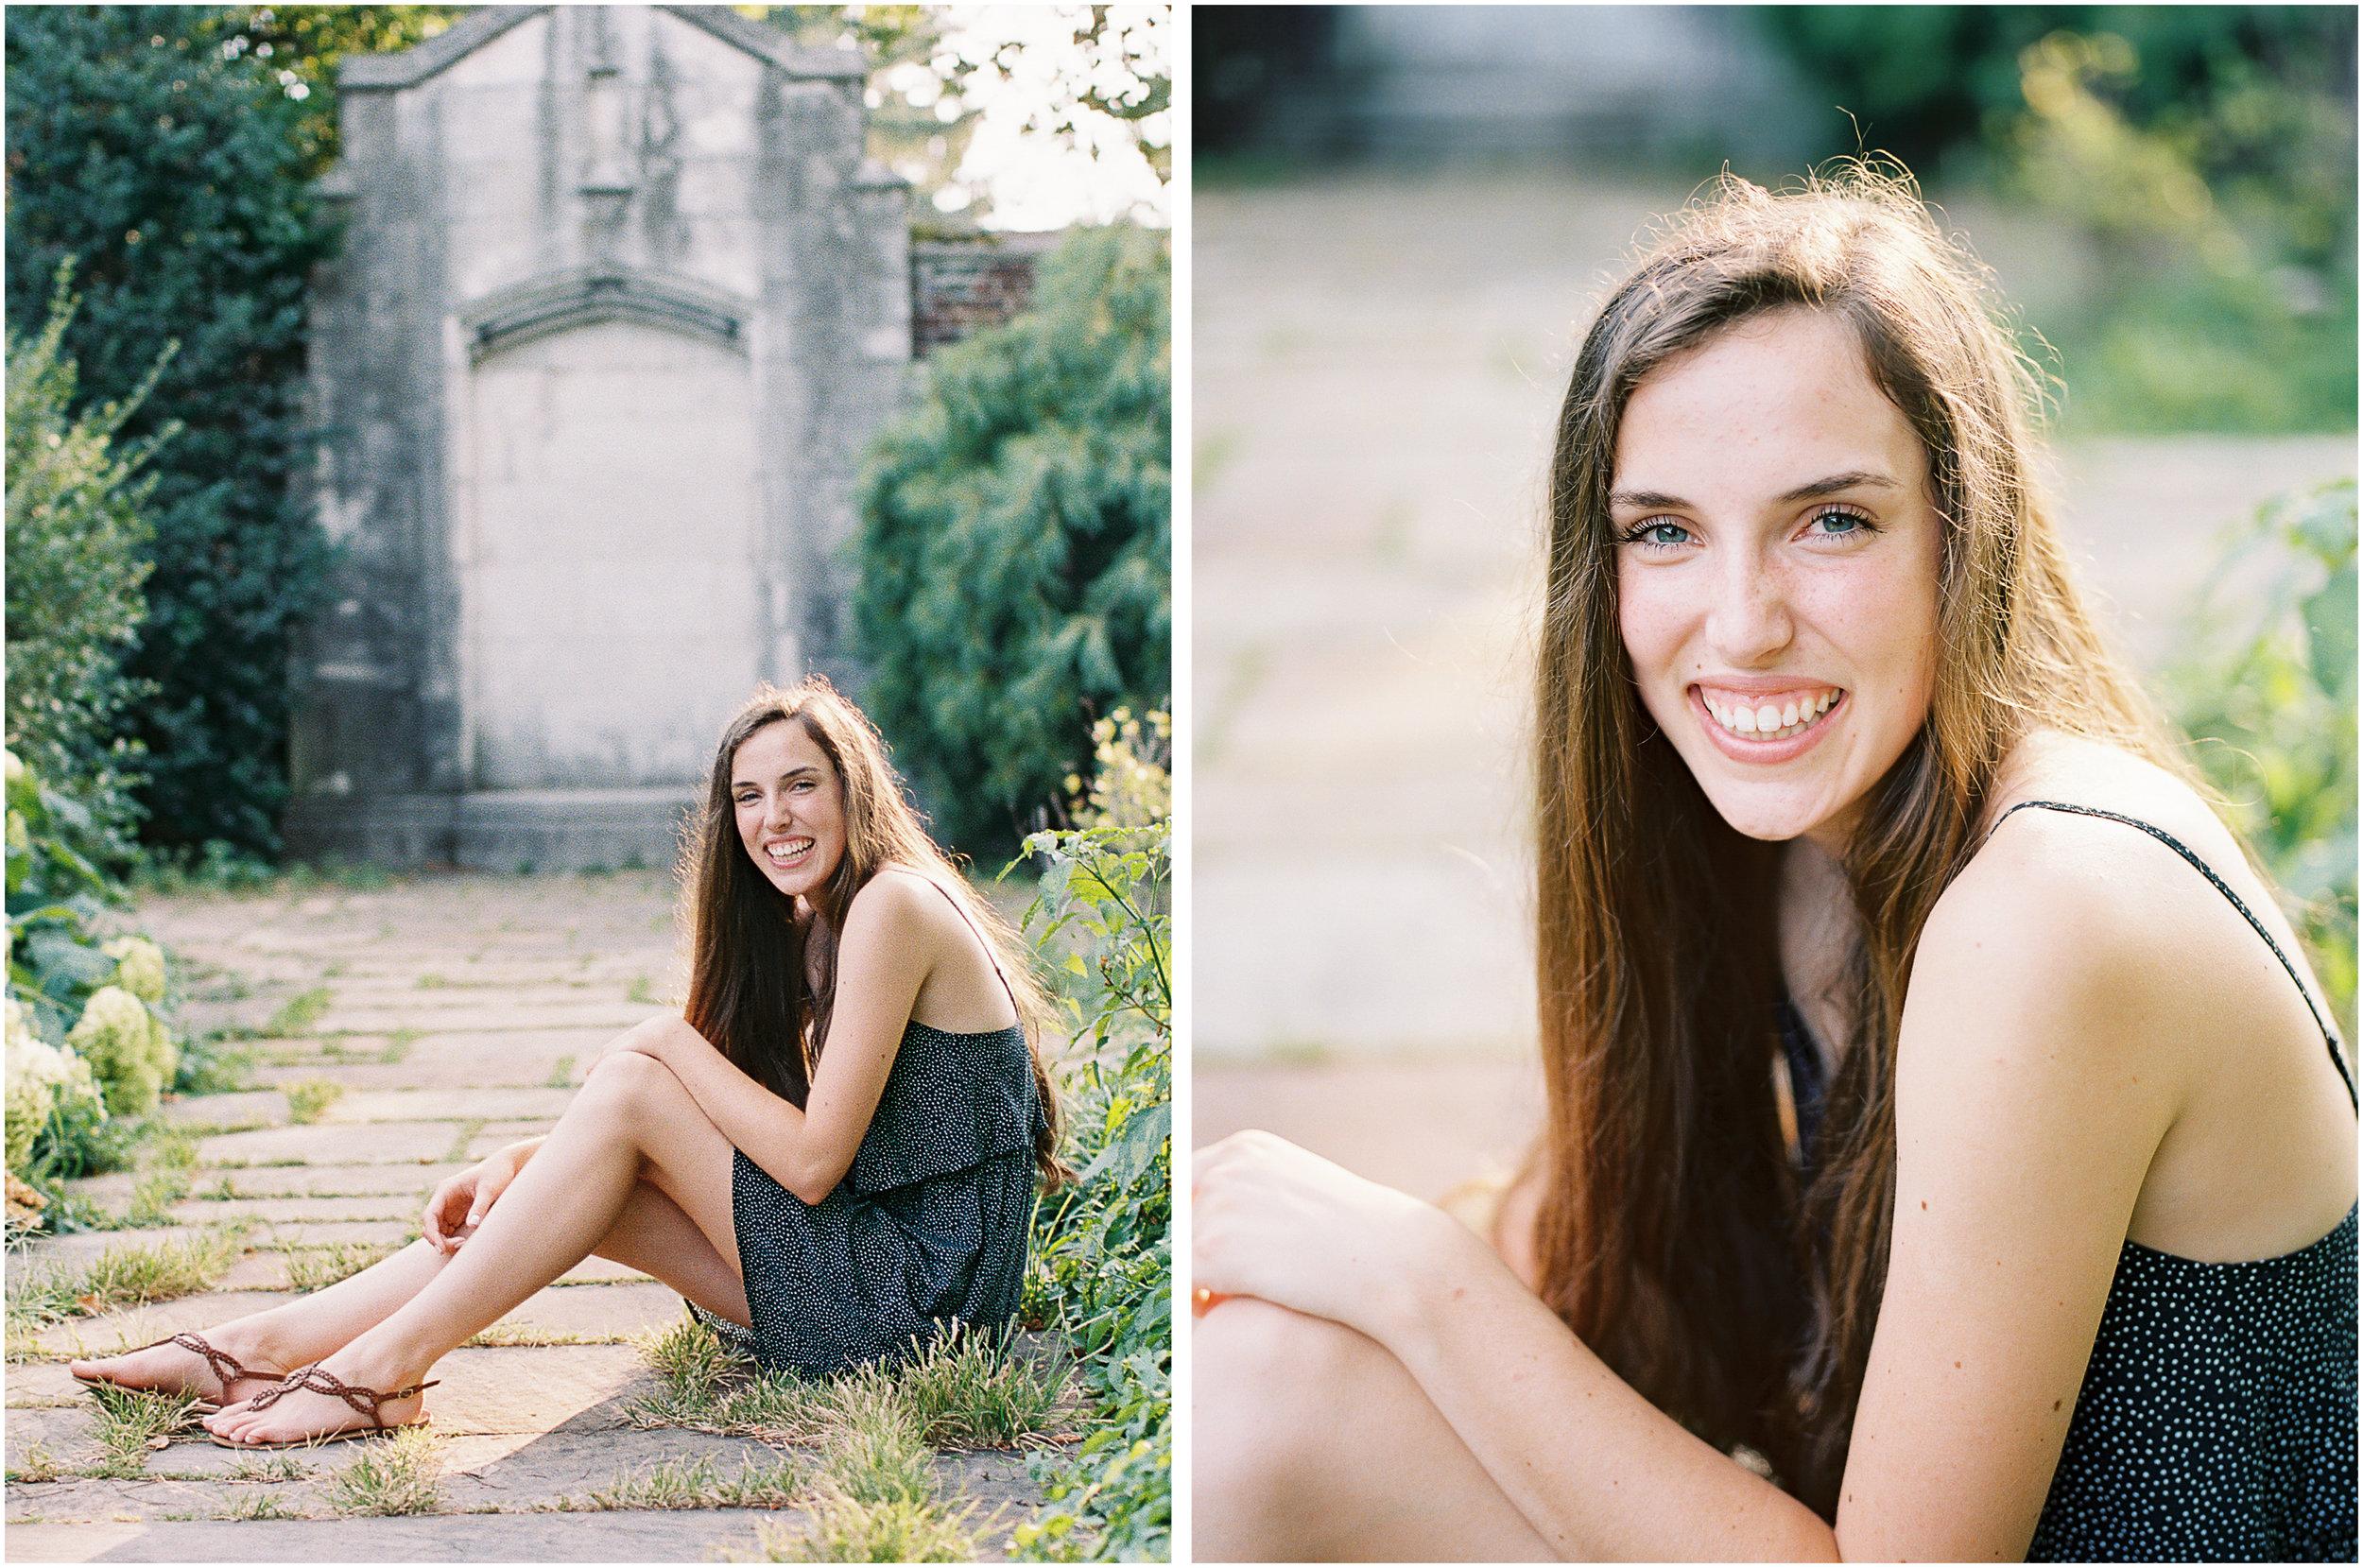 pennsylvania Highschool senior photographer anna laero photography.jpg